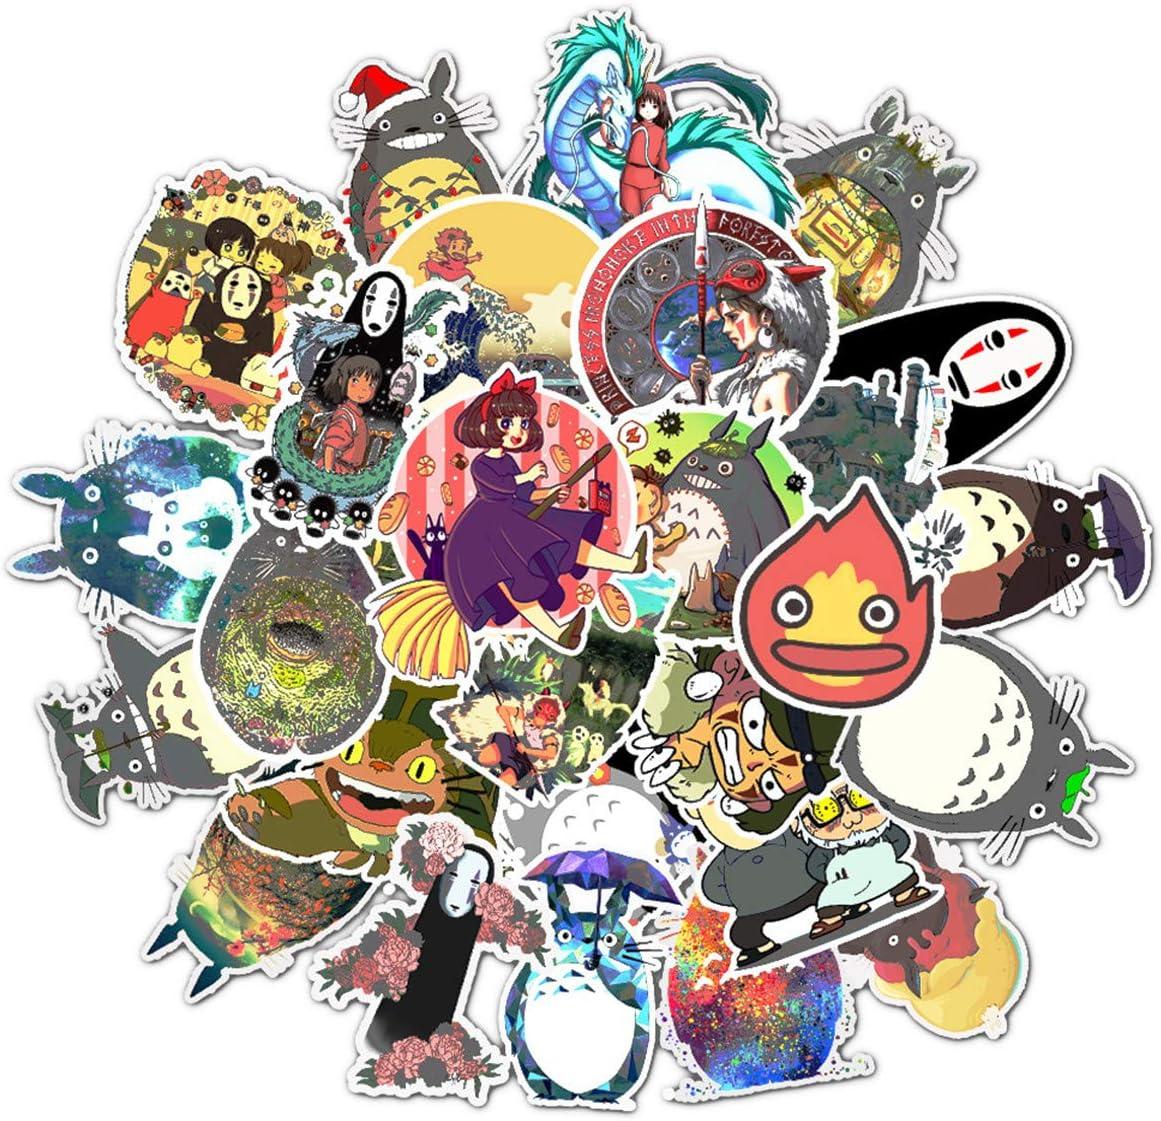 Miyazaki Hayao Theme Stickers Pack of 50 Stickers - My Neighbor Totoro Stickers for Laptops, Funny Stickers for Laptops, Computers (Miyazaki Hayao)